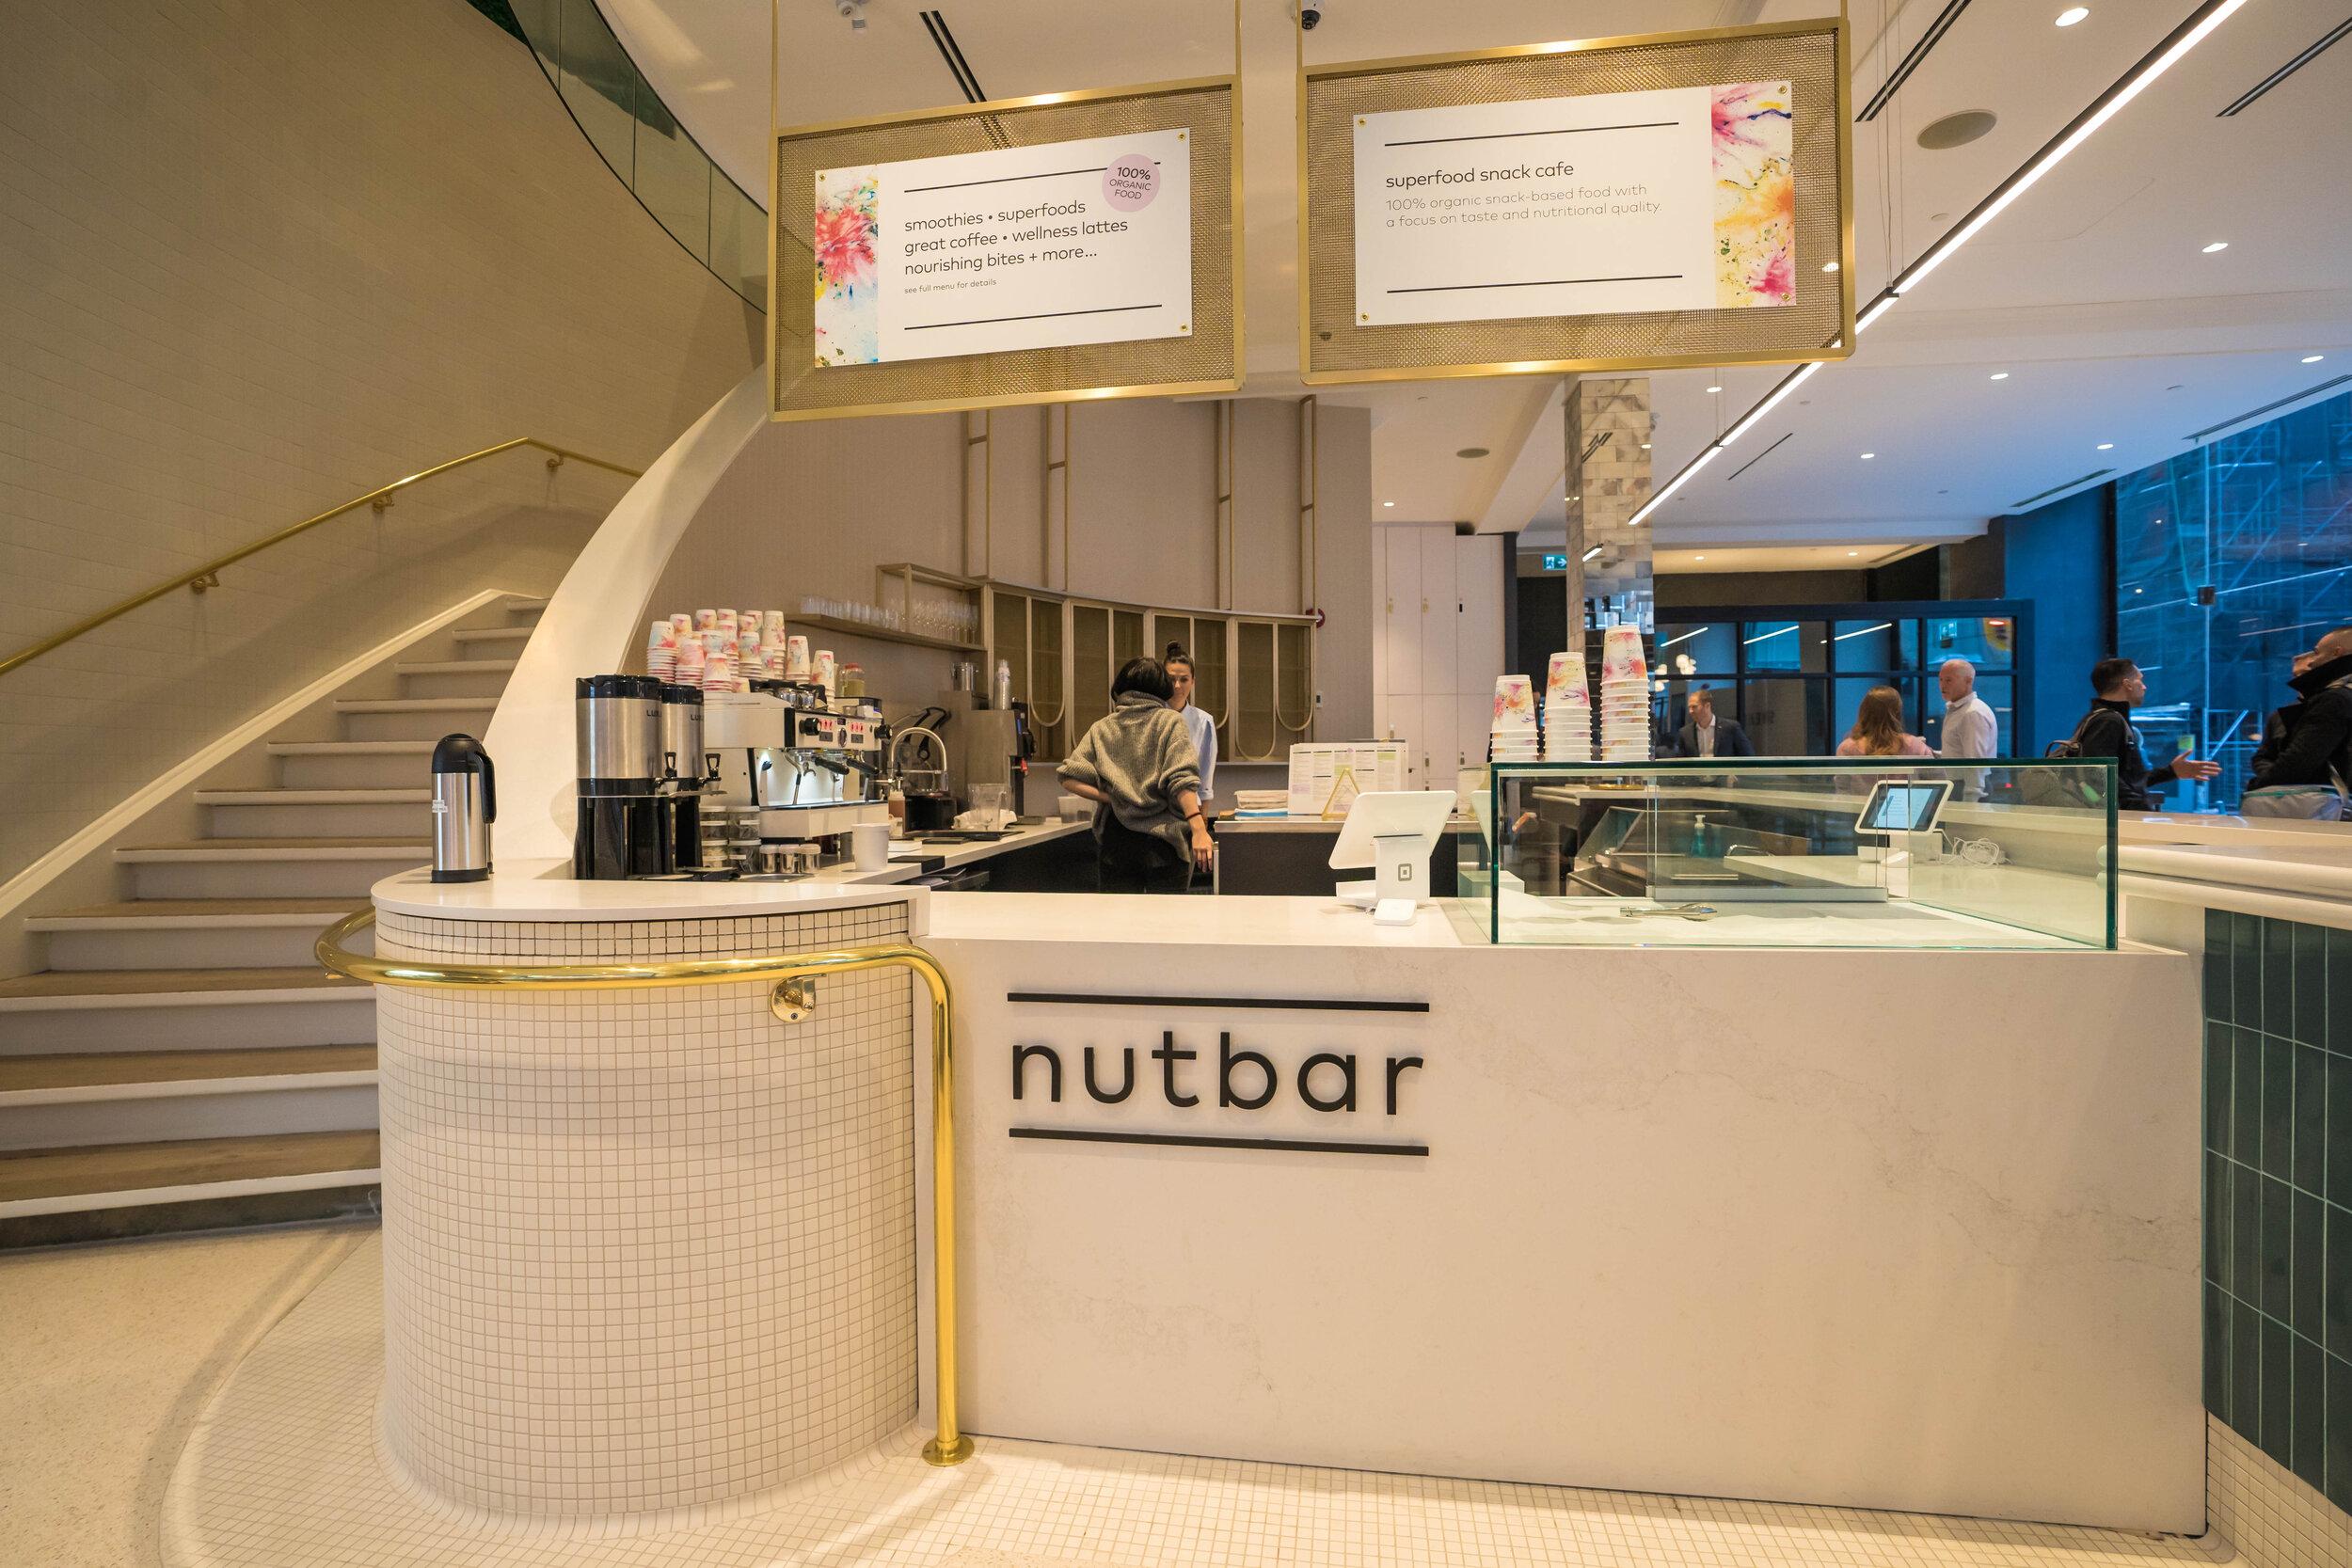 nutbar. photo: sweat & tonic